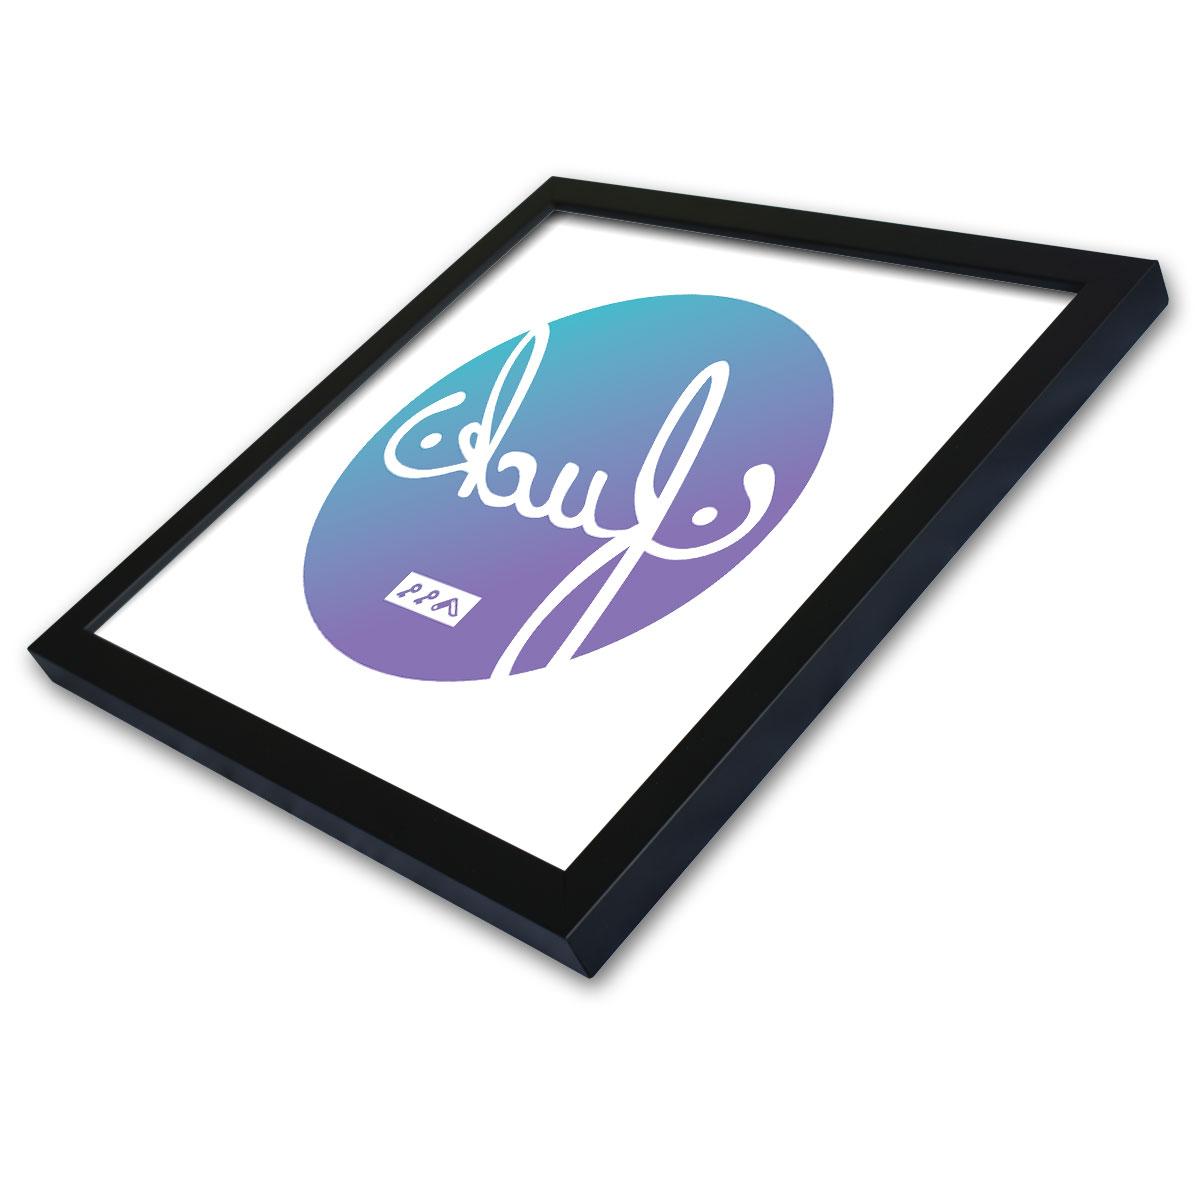 zero fucks given framed prints by kikicutt